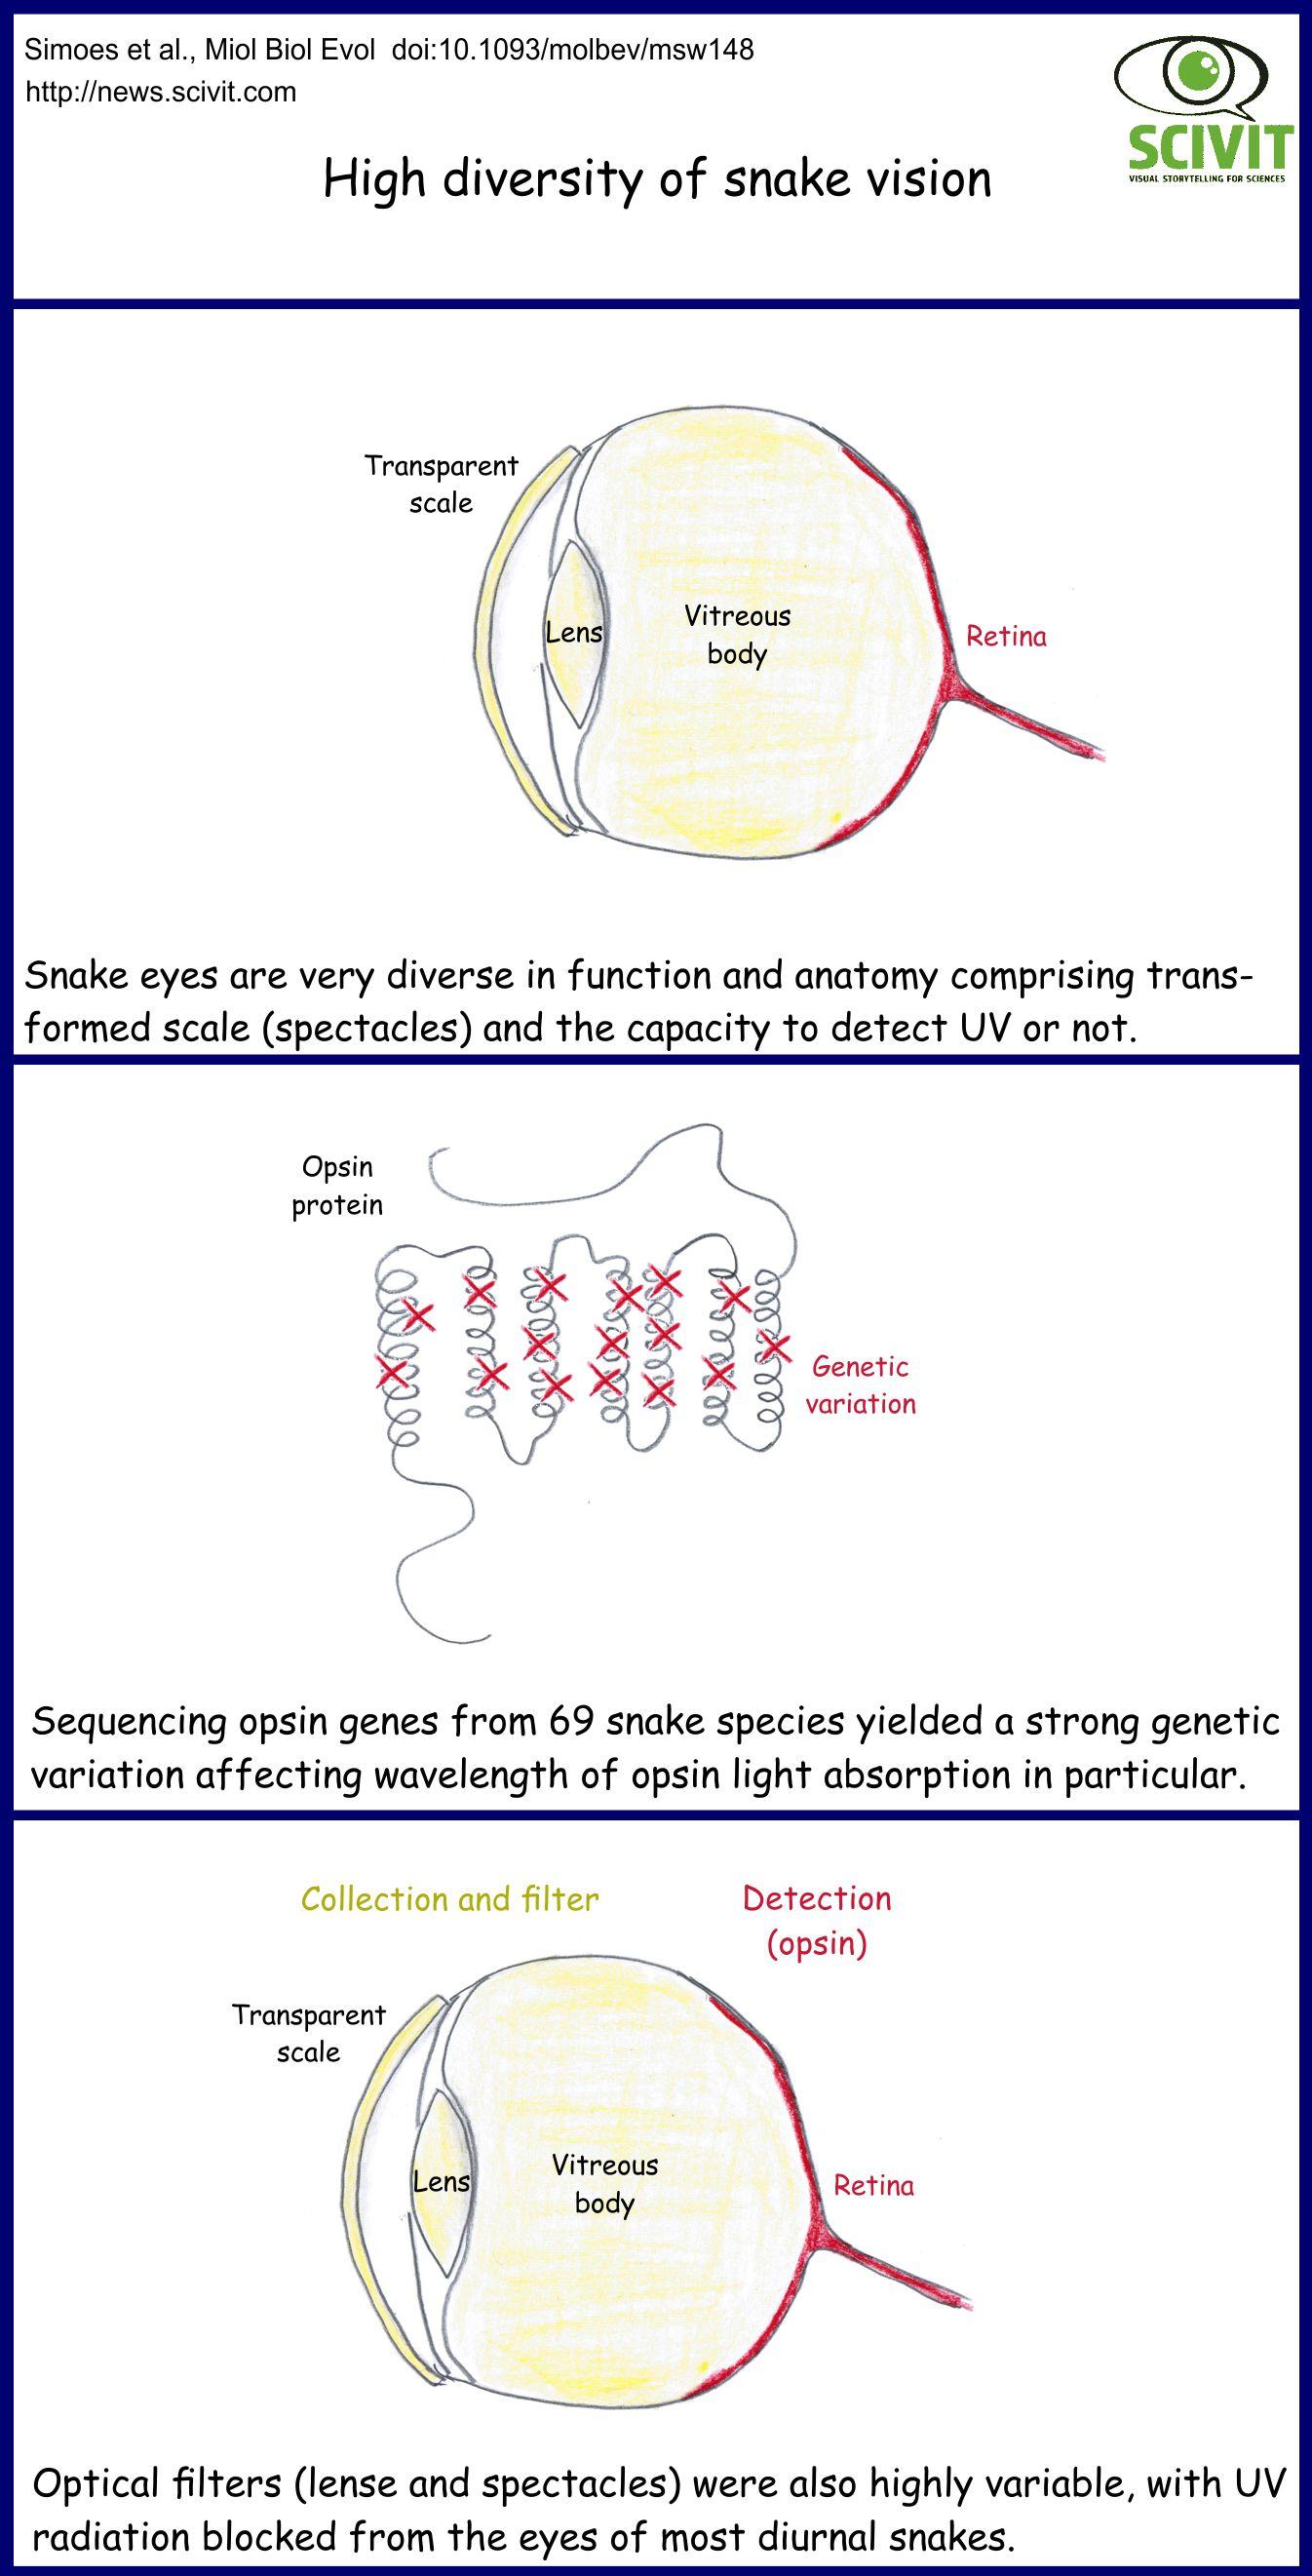 High diversity in snake vision